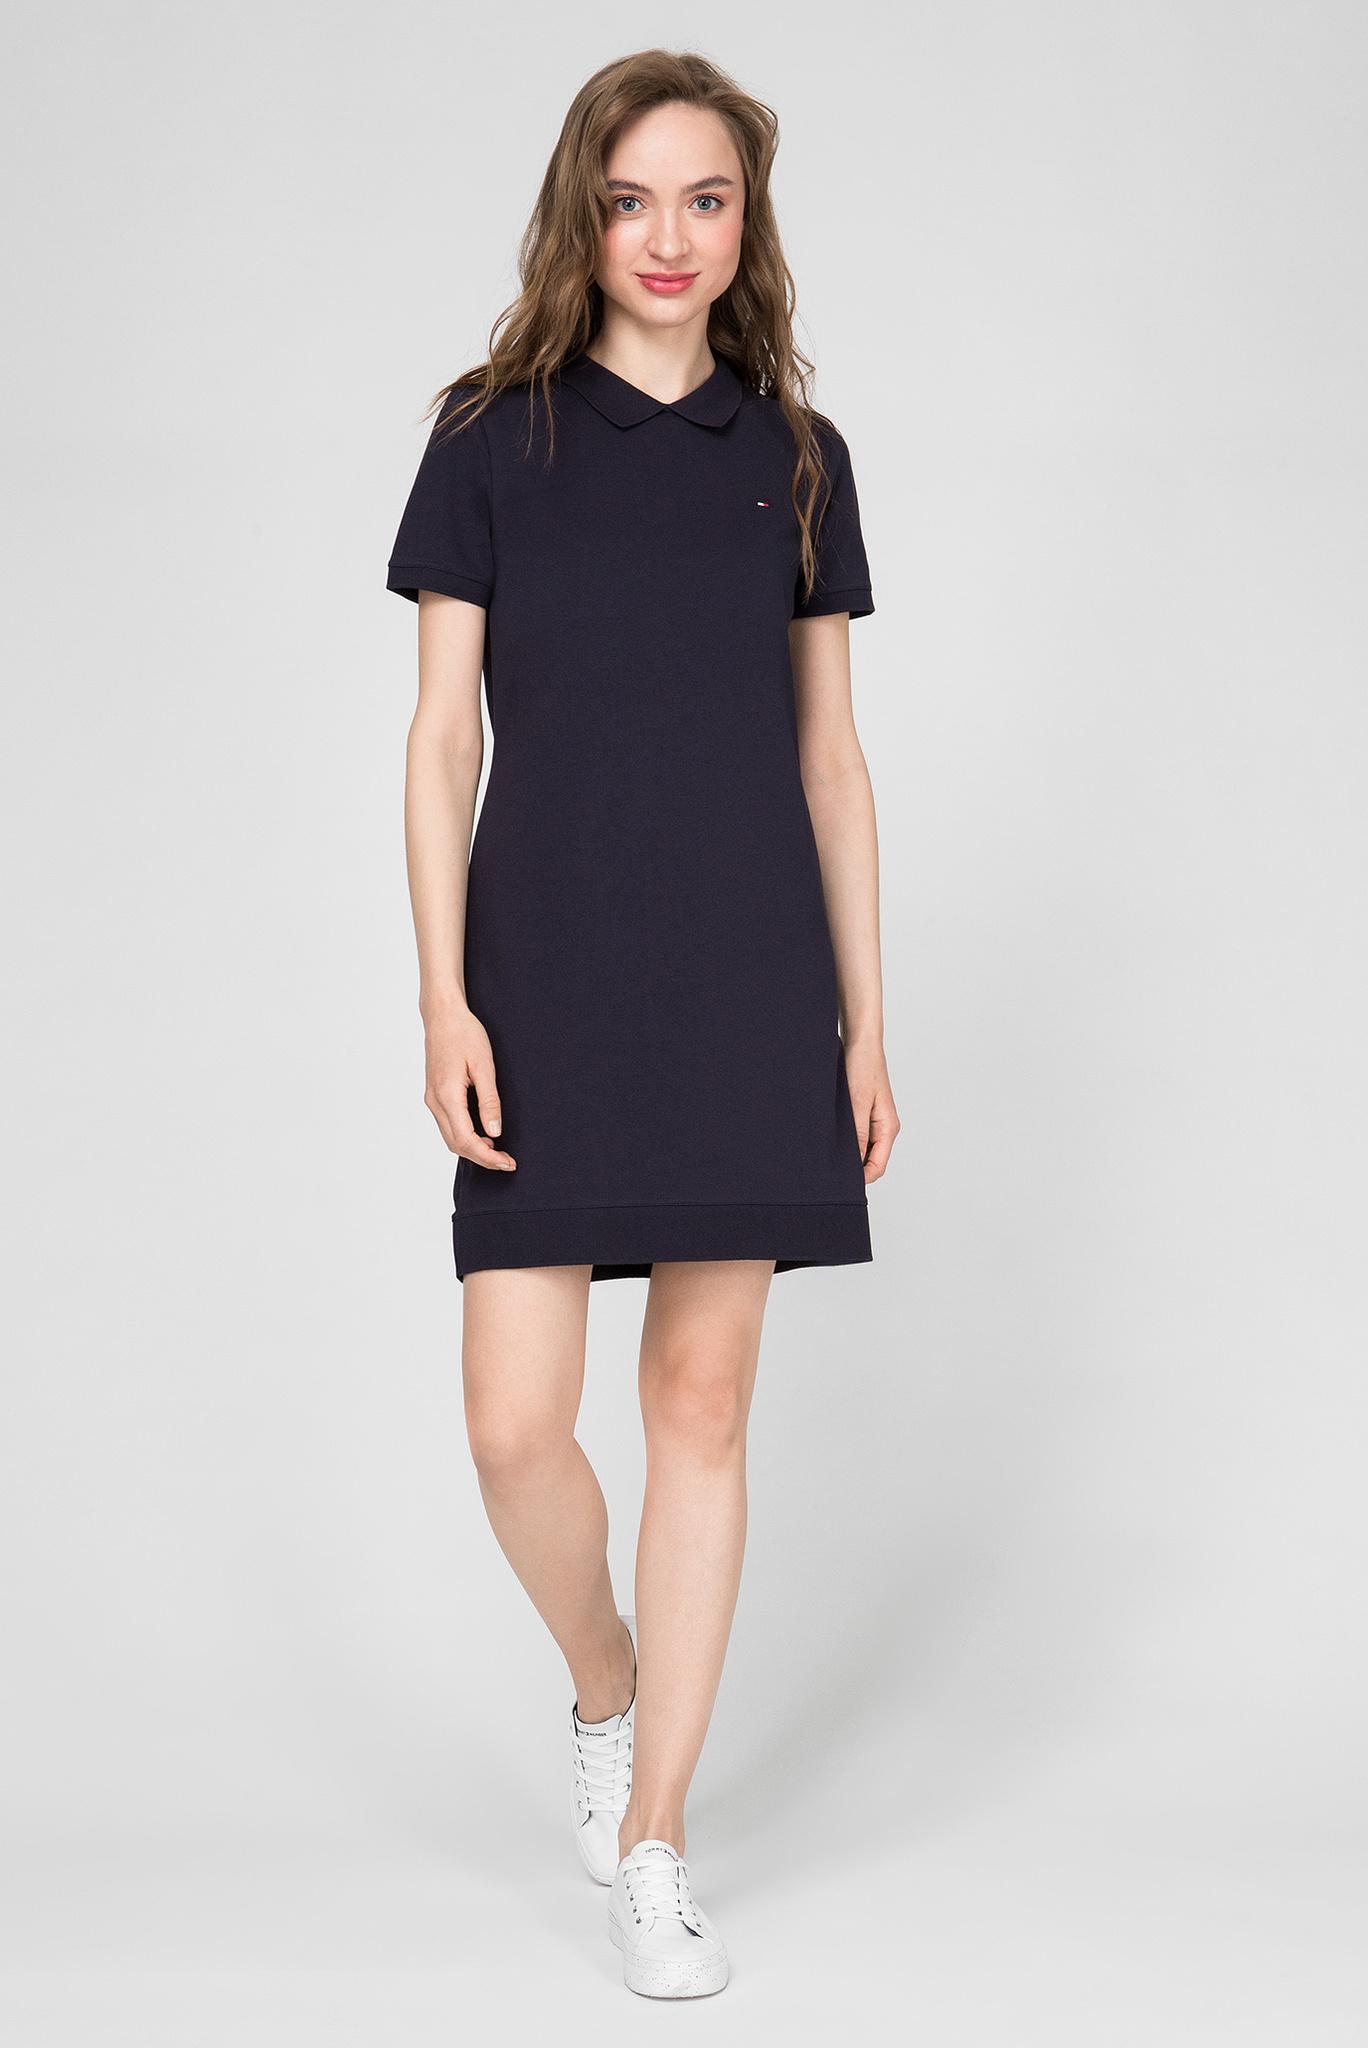 Женское темно-синее платье Relaxed Fit Tommy Hilfiger